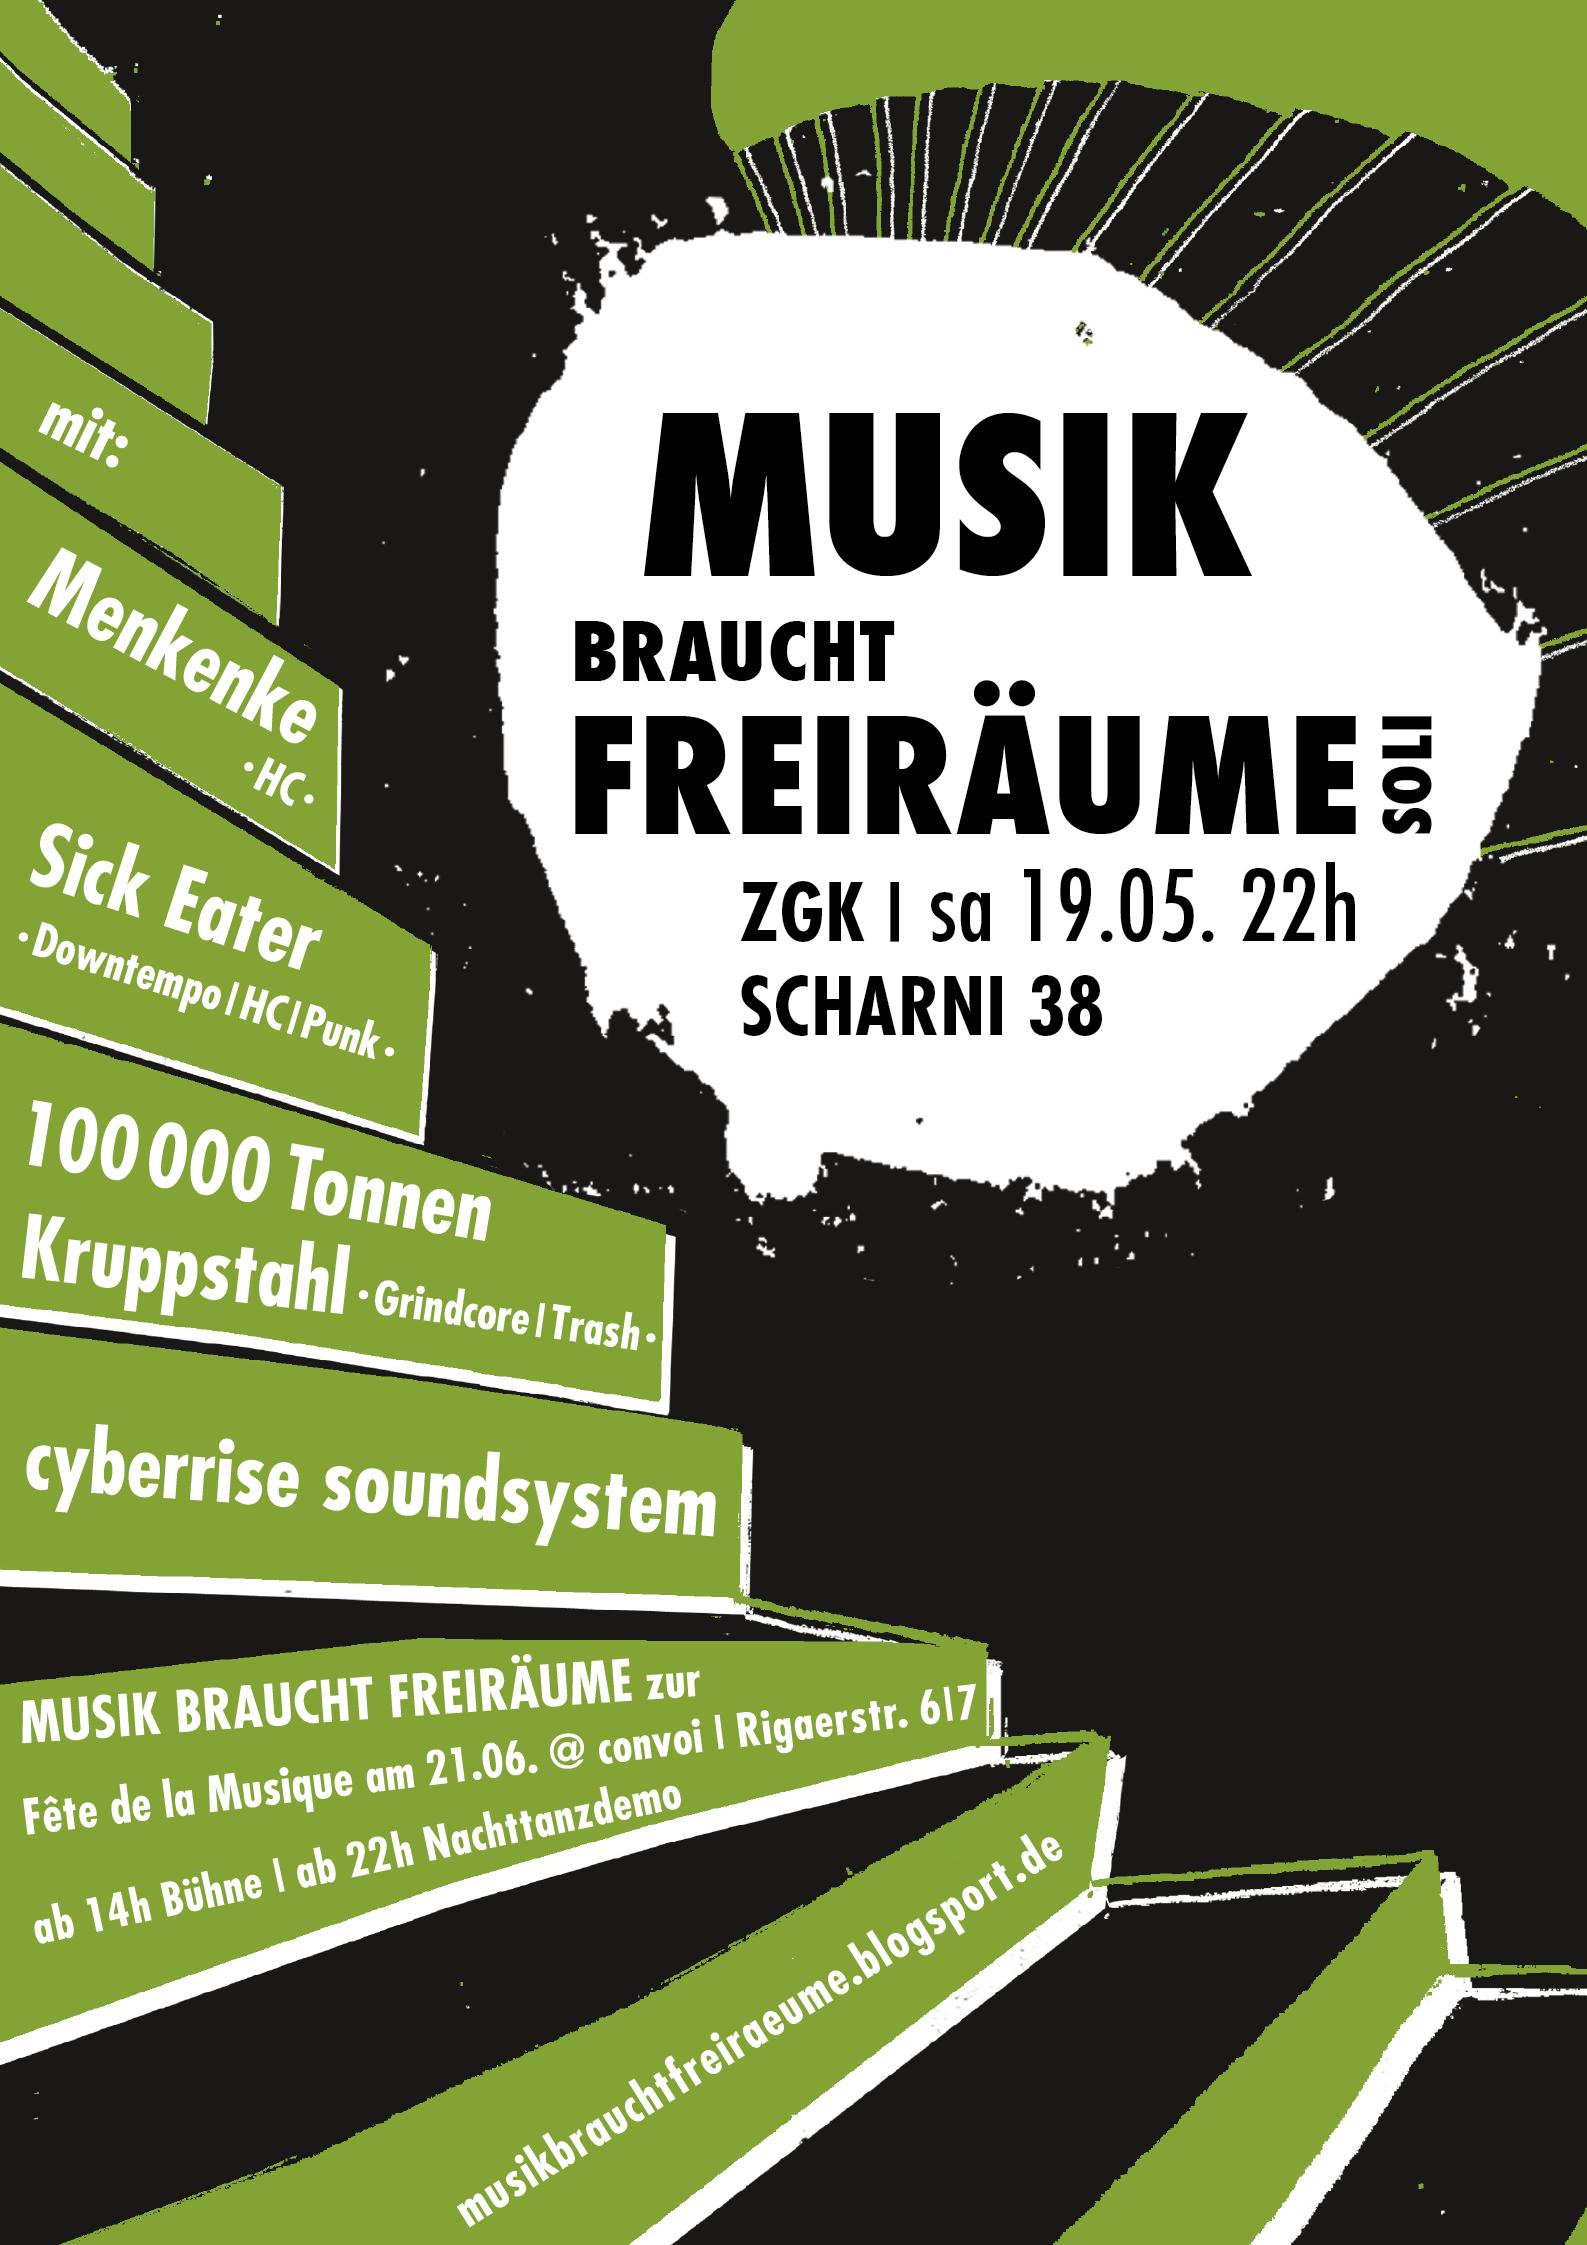 MBF,Soli,Scharni38,19.5.12,Plakat